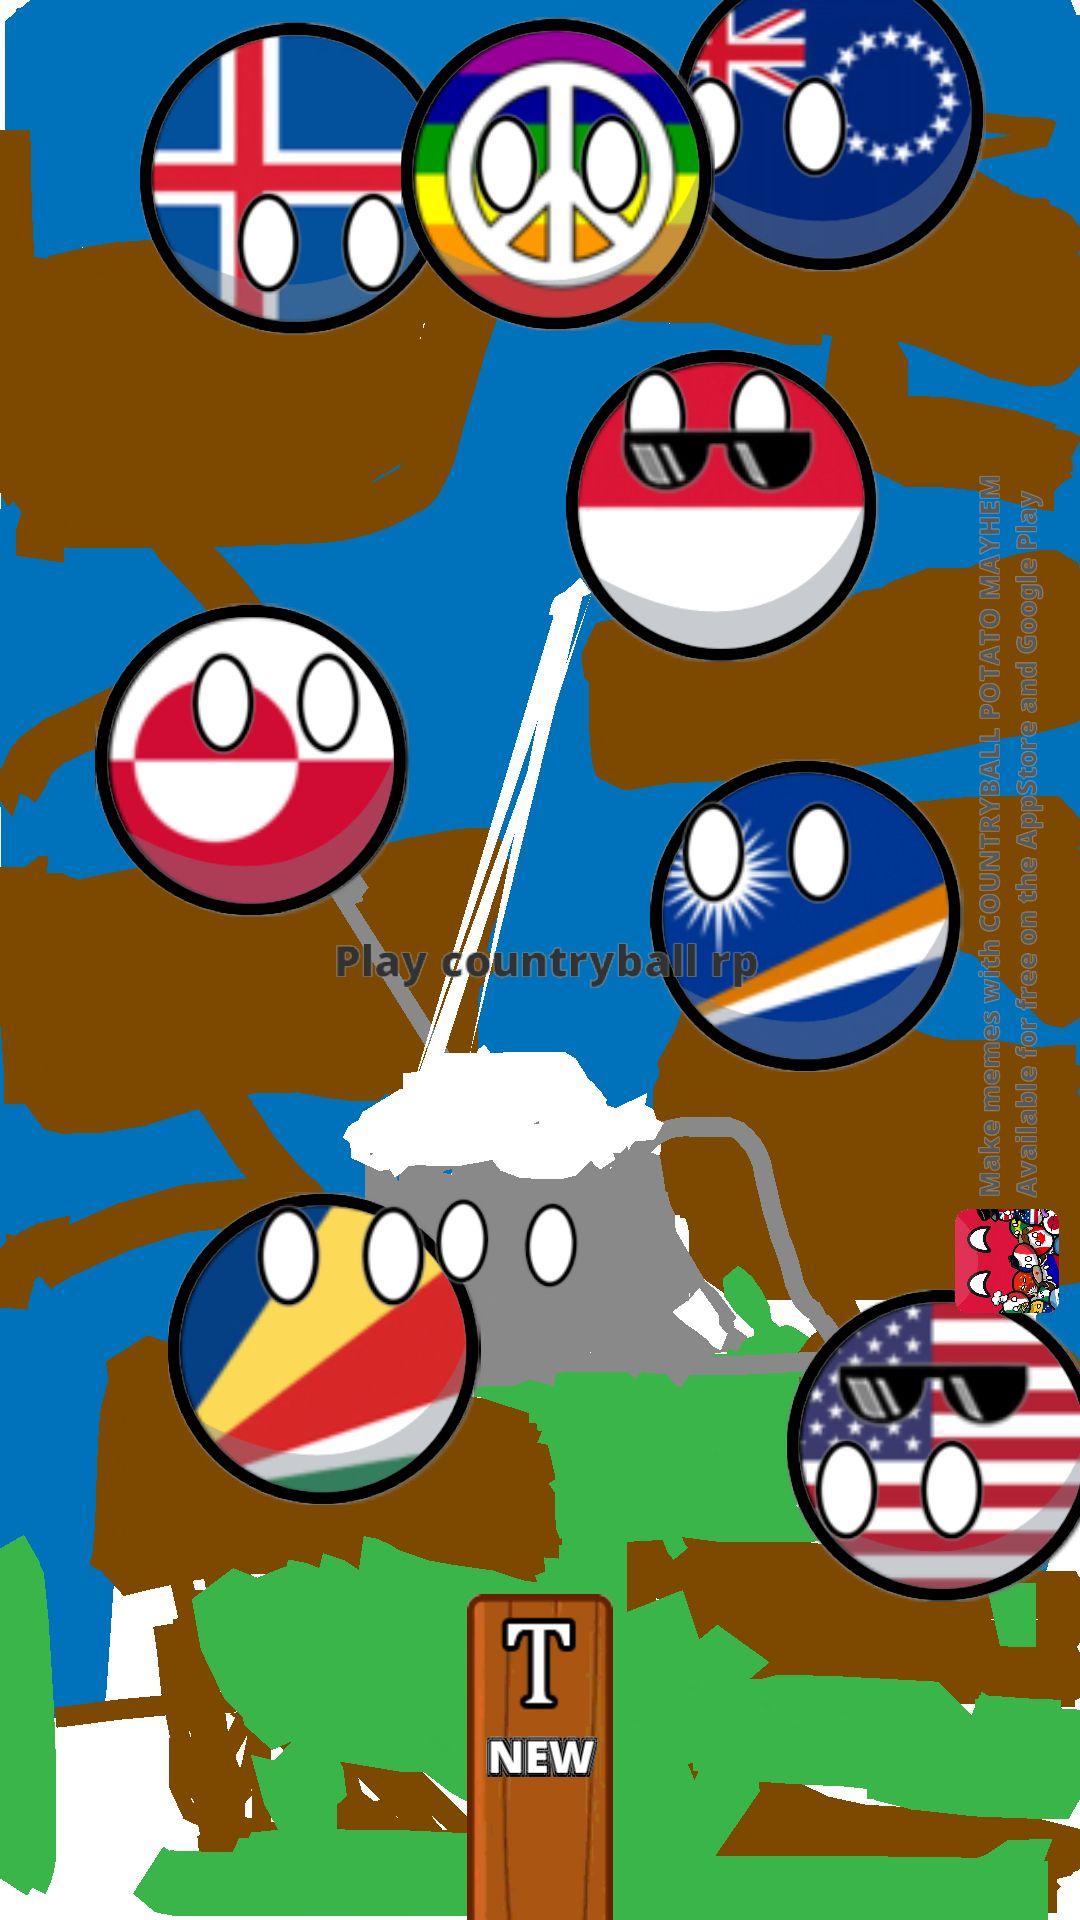 Download Countryball Potato Mayhem S Meme Creator For Free Appstore Https Itunes Apple Com Us App Countryball Id Google Play Store Meme Creator Google Play